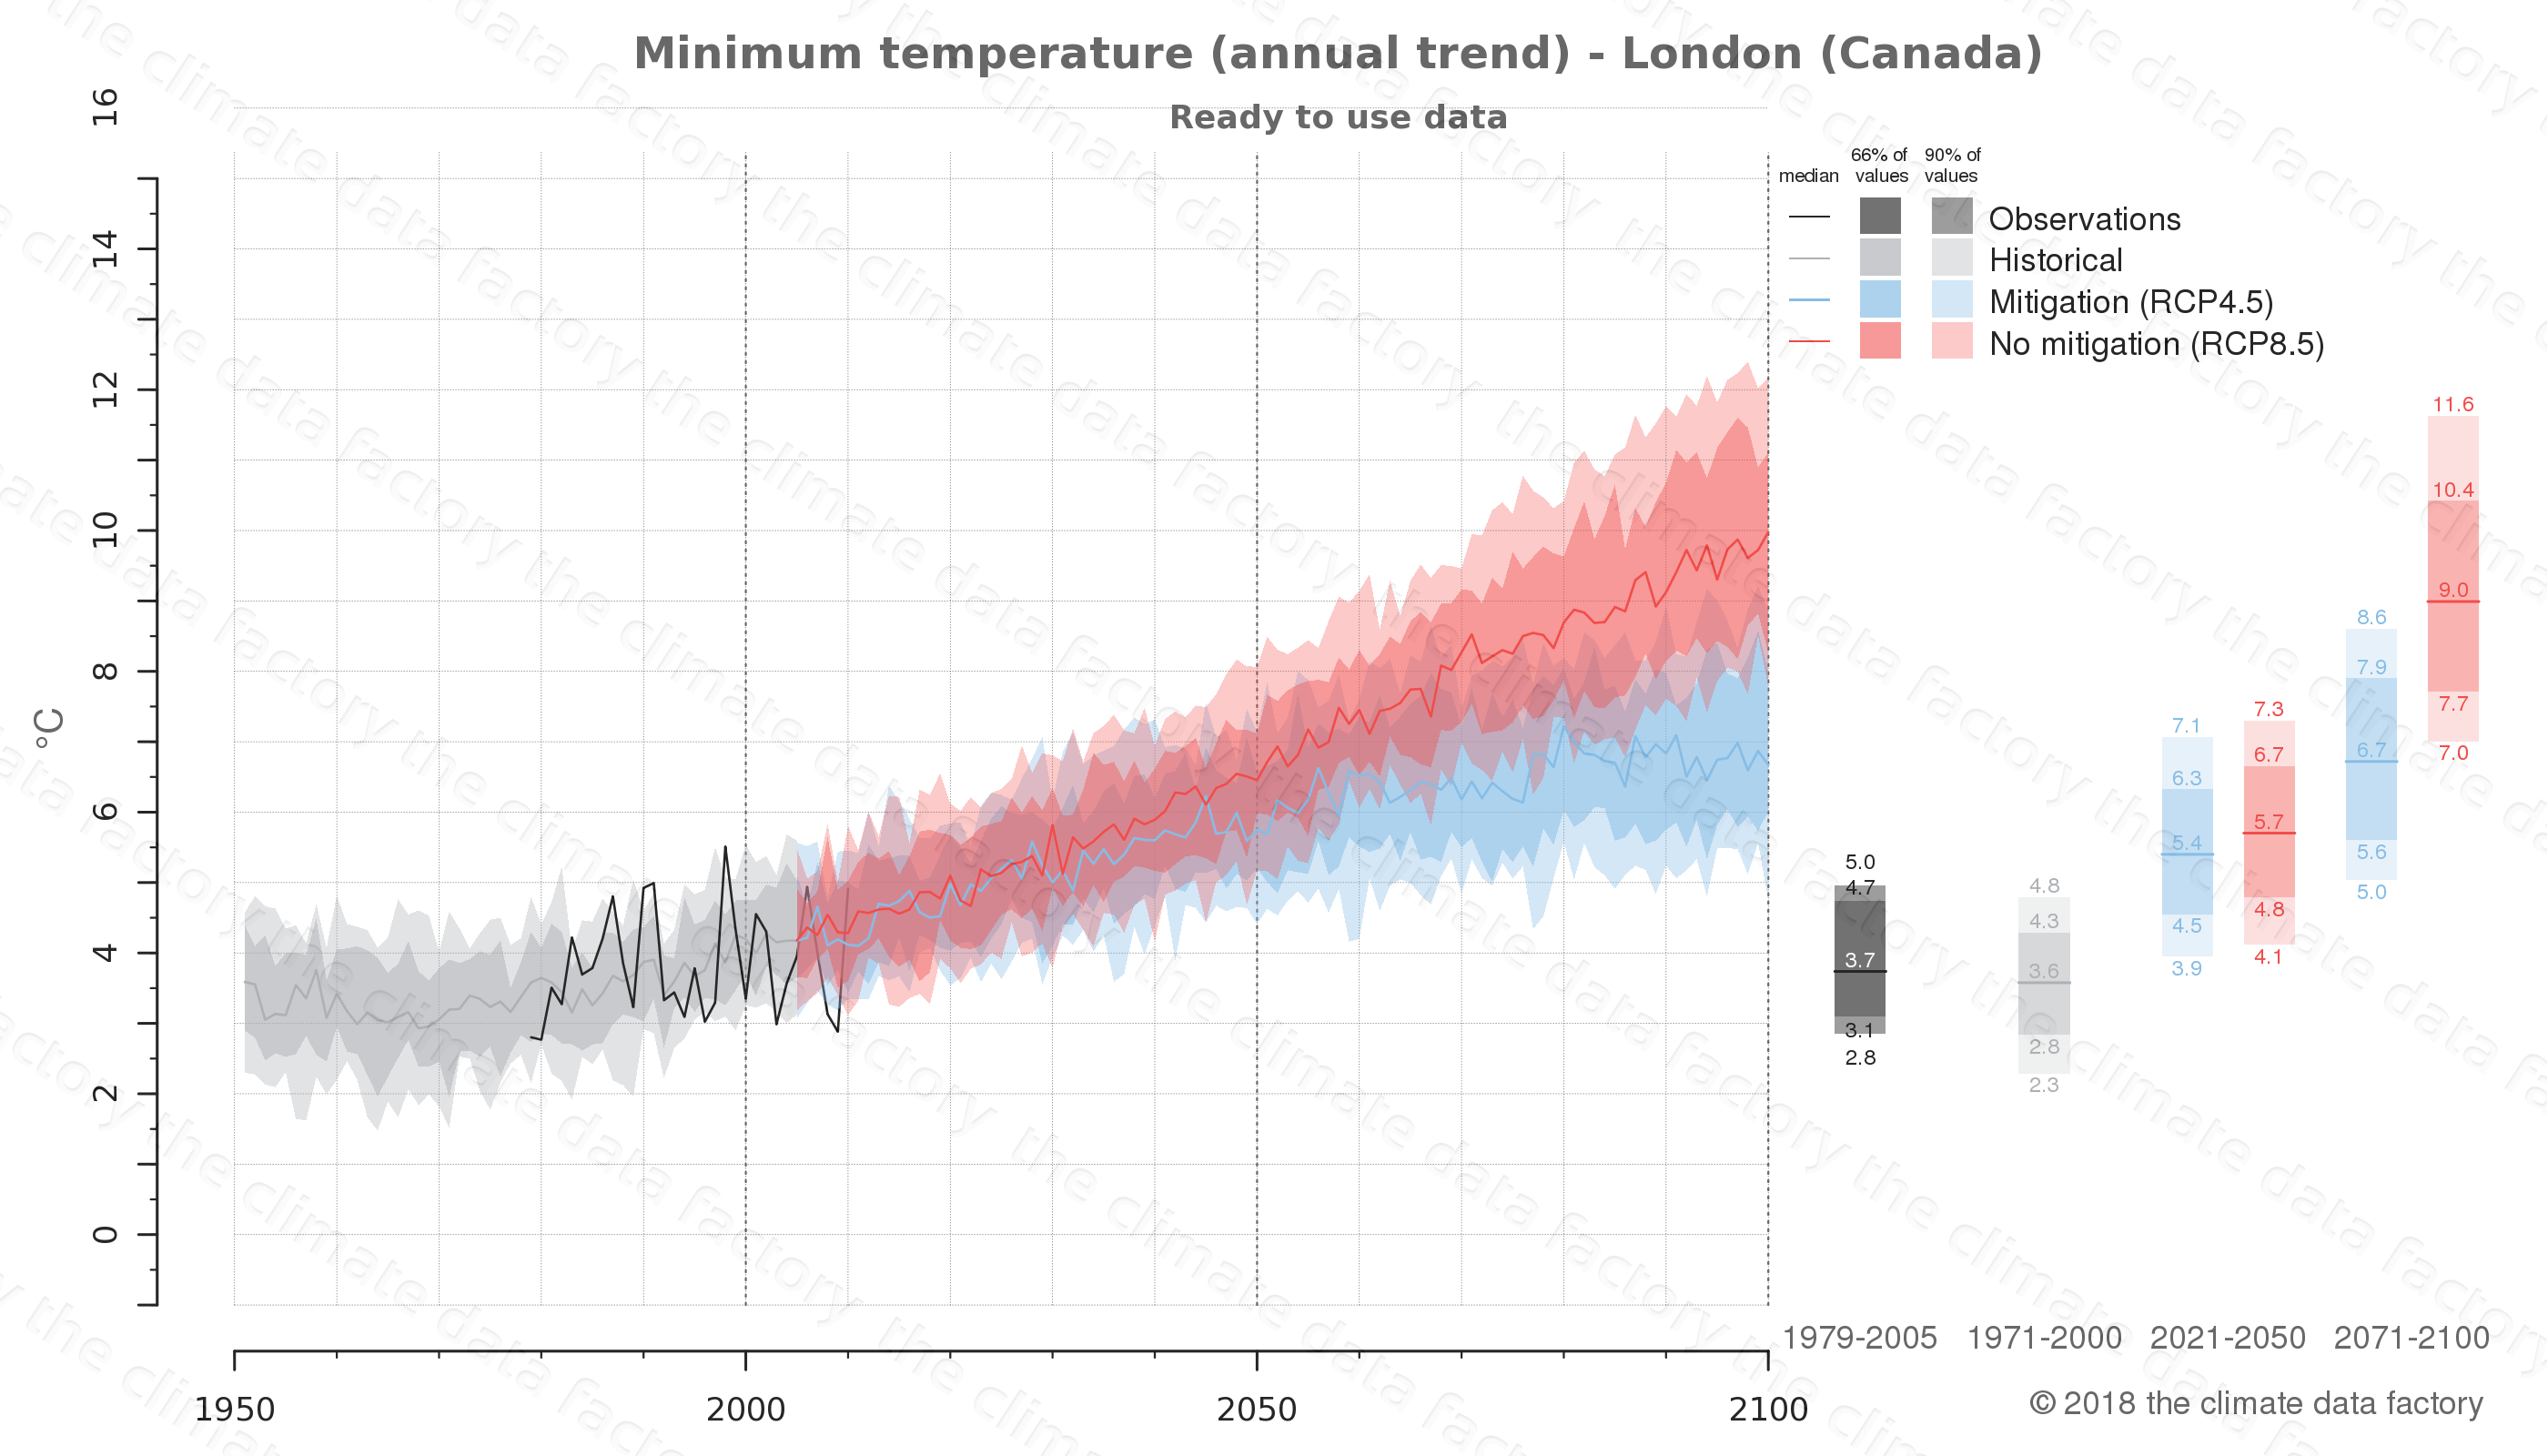 climate change data policy adaptation climate graph city data minimum-temperature london canada